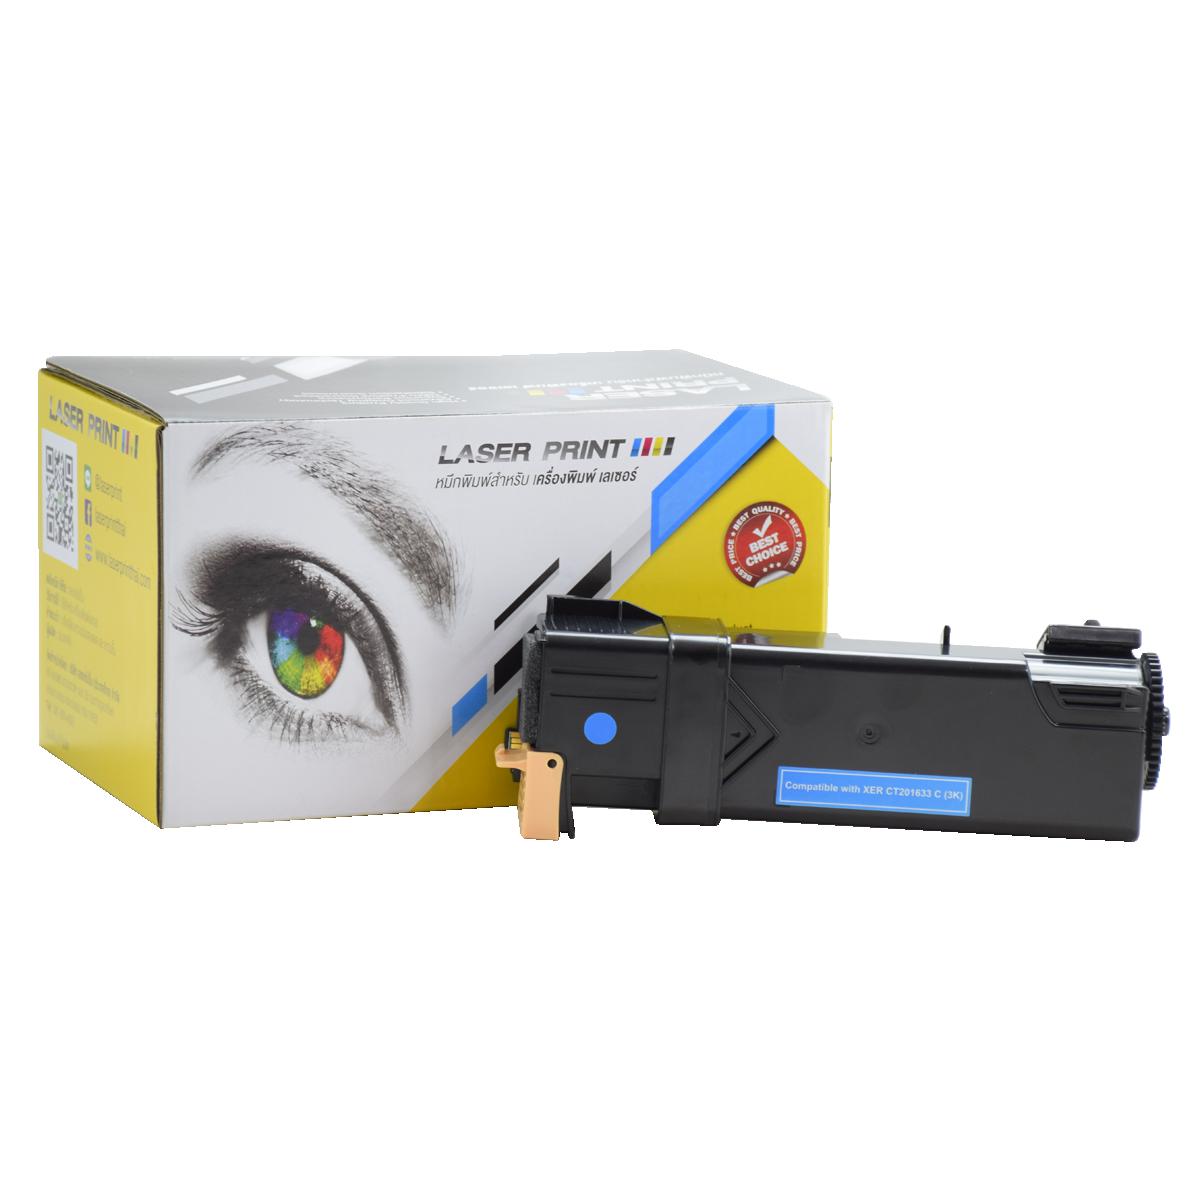 CT201633 Laserprint (for xerox CP305/CM305) Blue